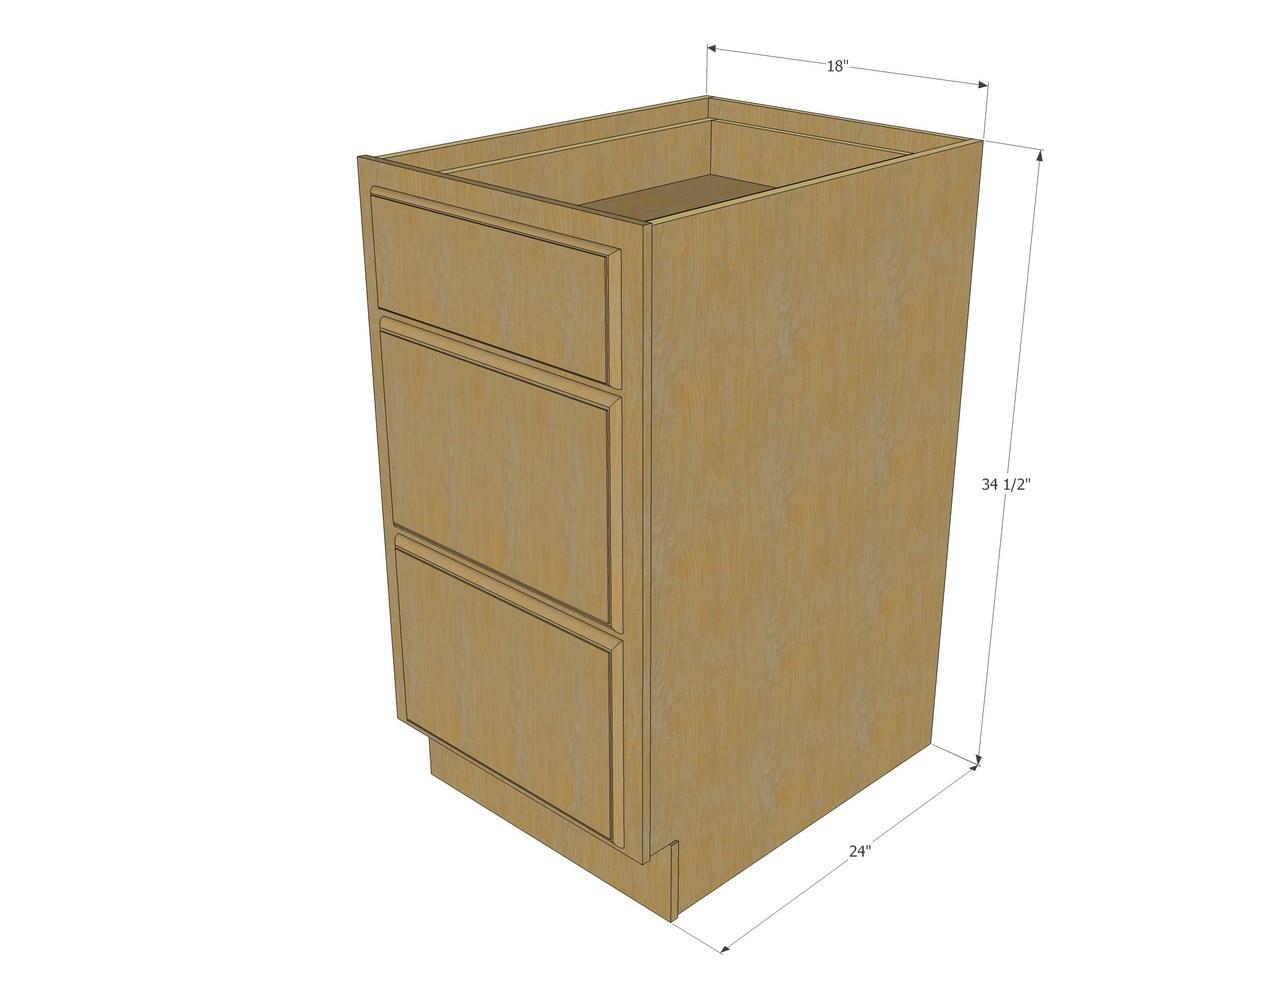 regal oak 3 drawer base cabinet 18 inch - kitchen cabinet warehouse